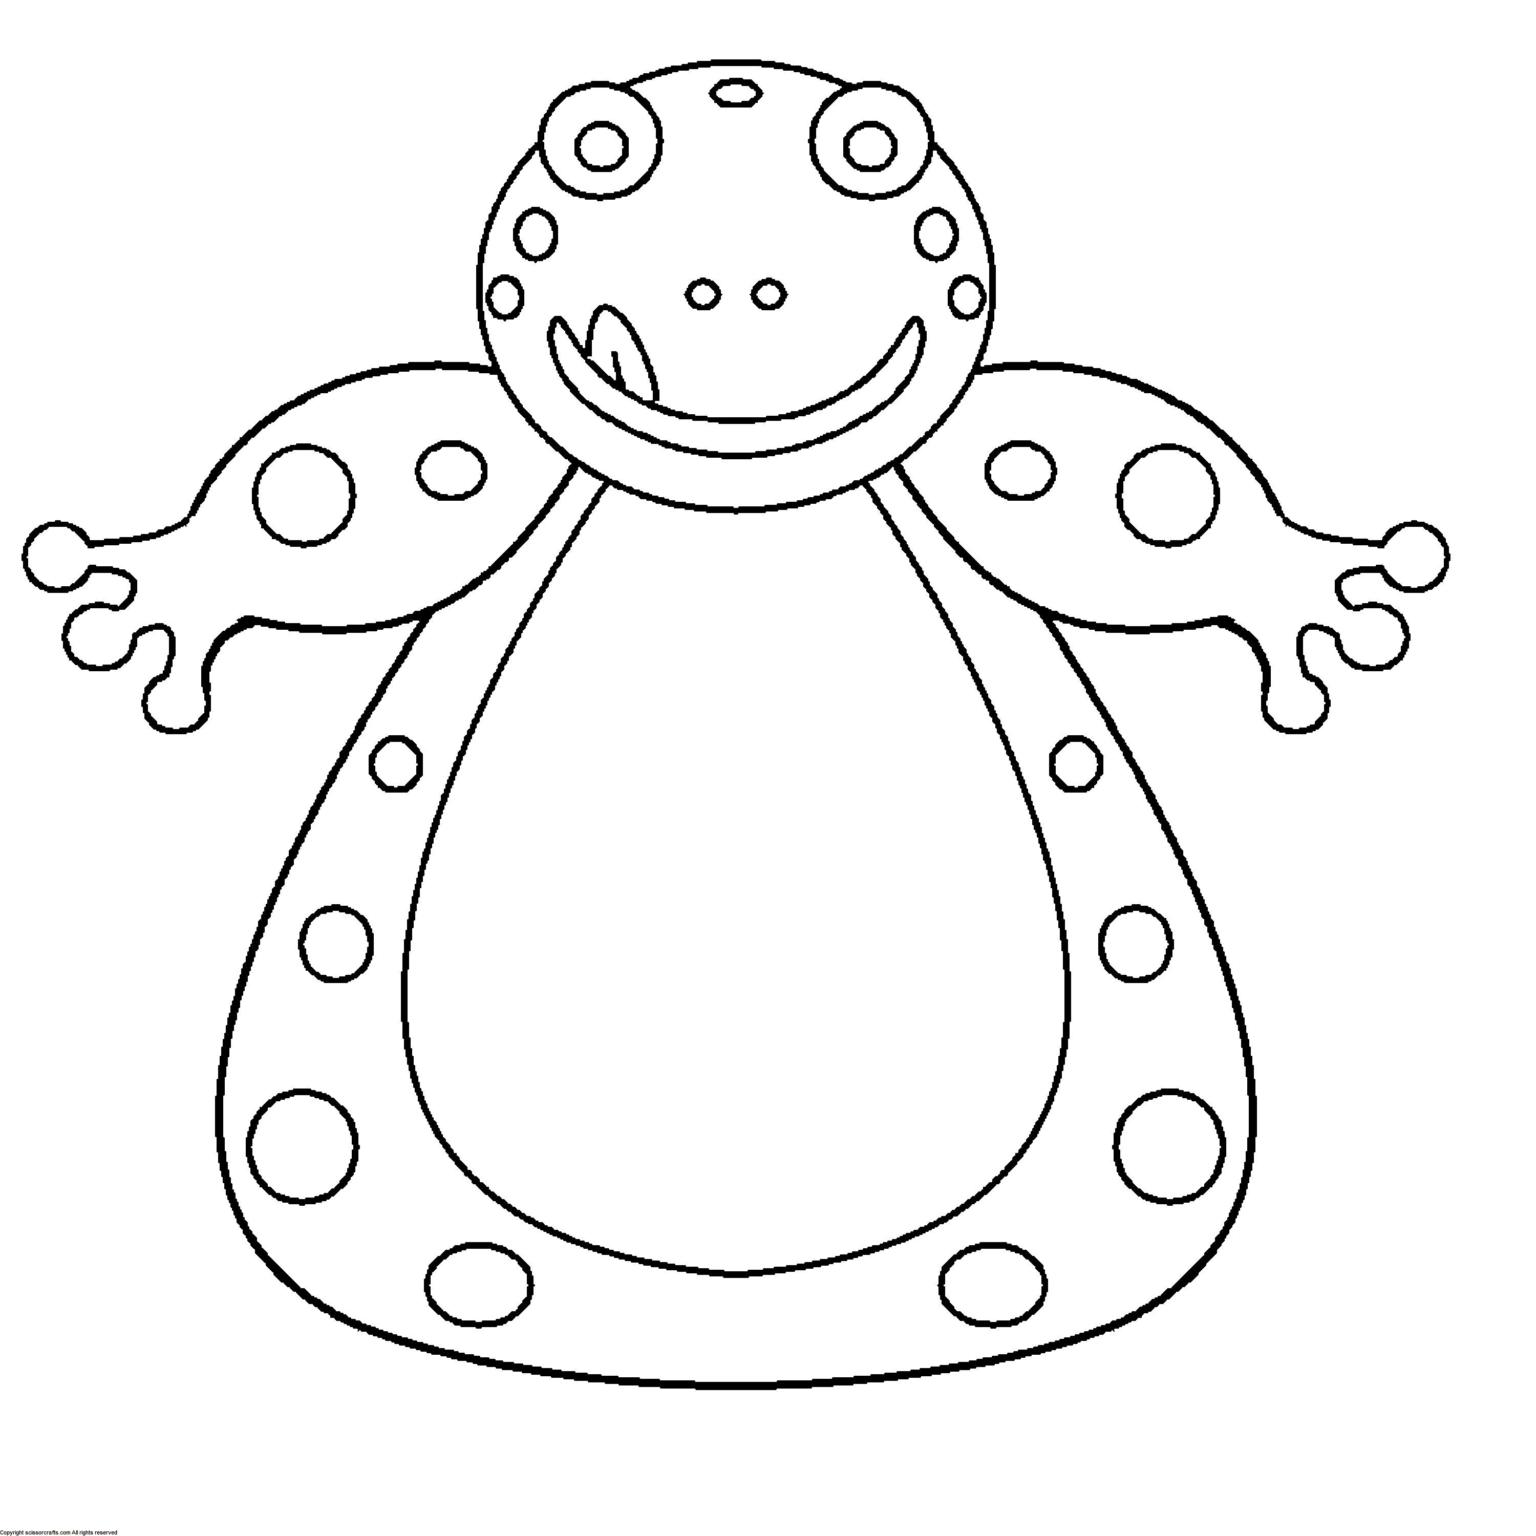 tangram frog shape outlines printable joy studio design gallery tangram frog